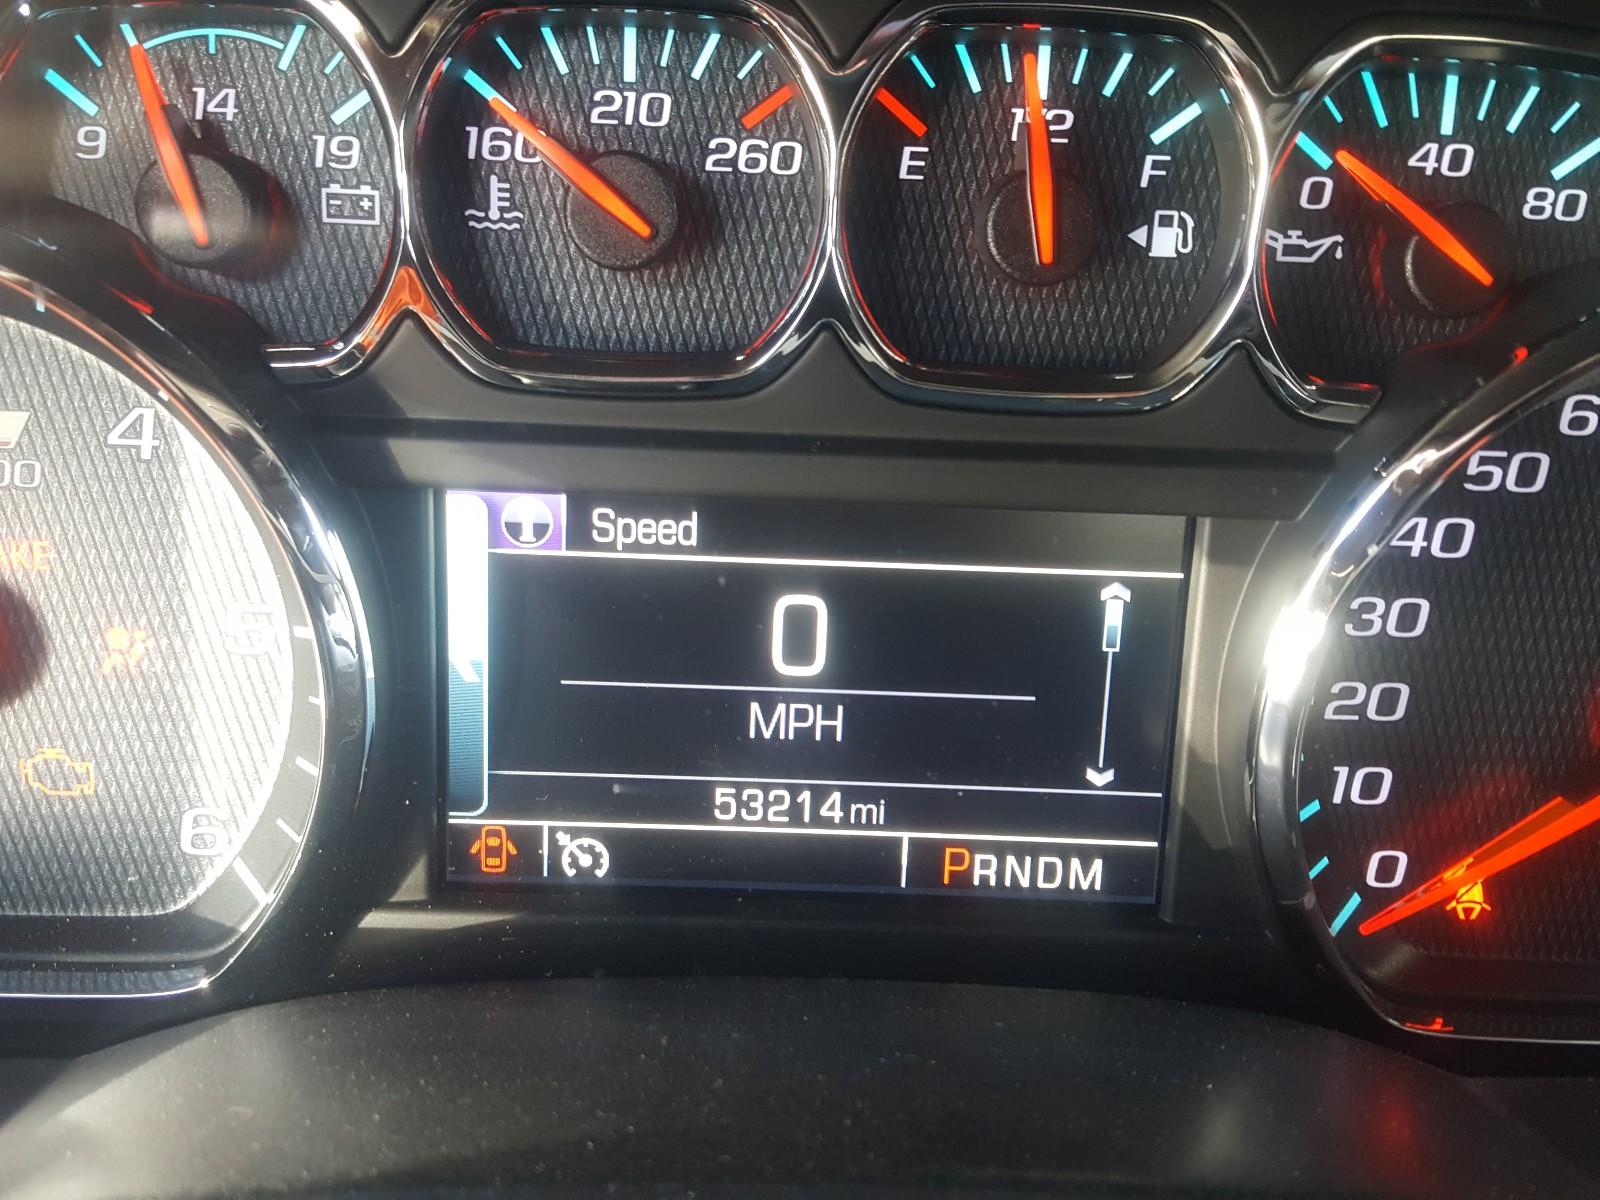 3GCUKREC0EG546934 - 2014 Chevrolet Silverado 5.3L front view